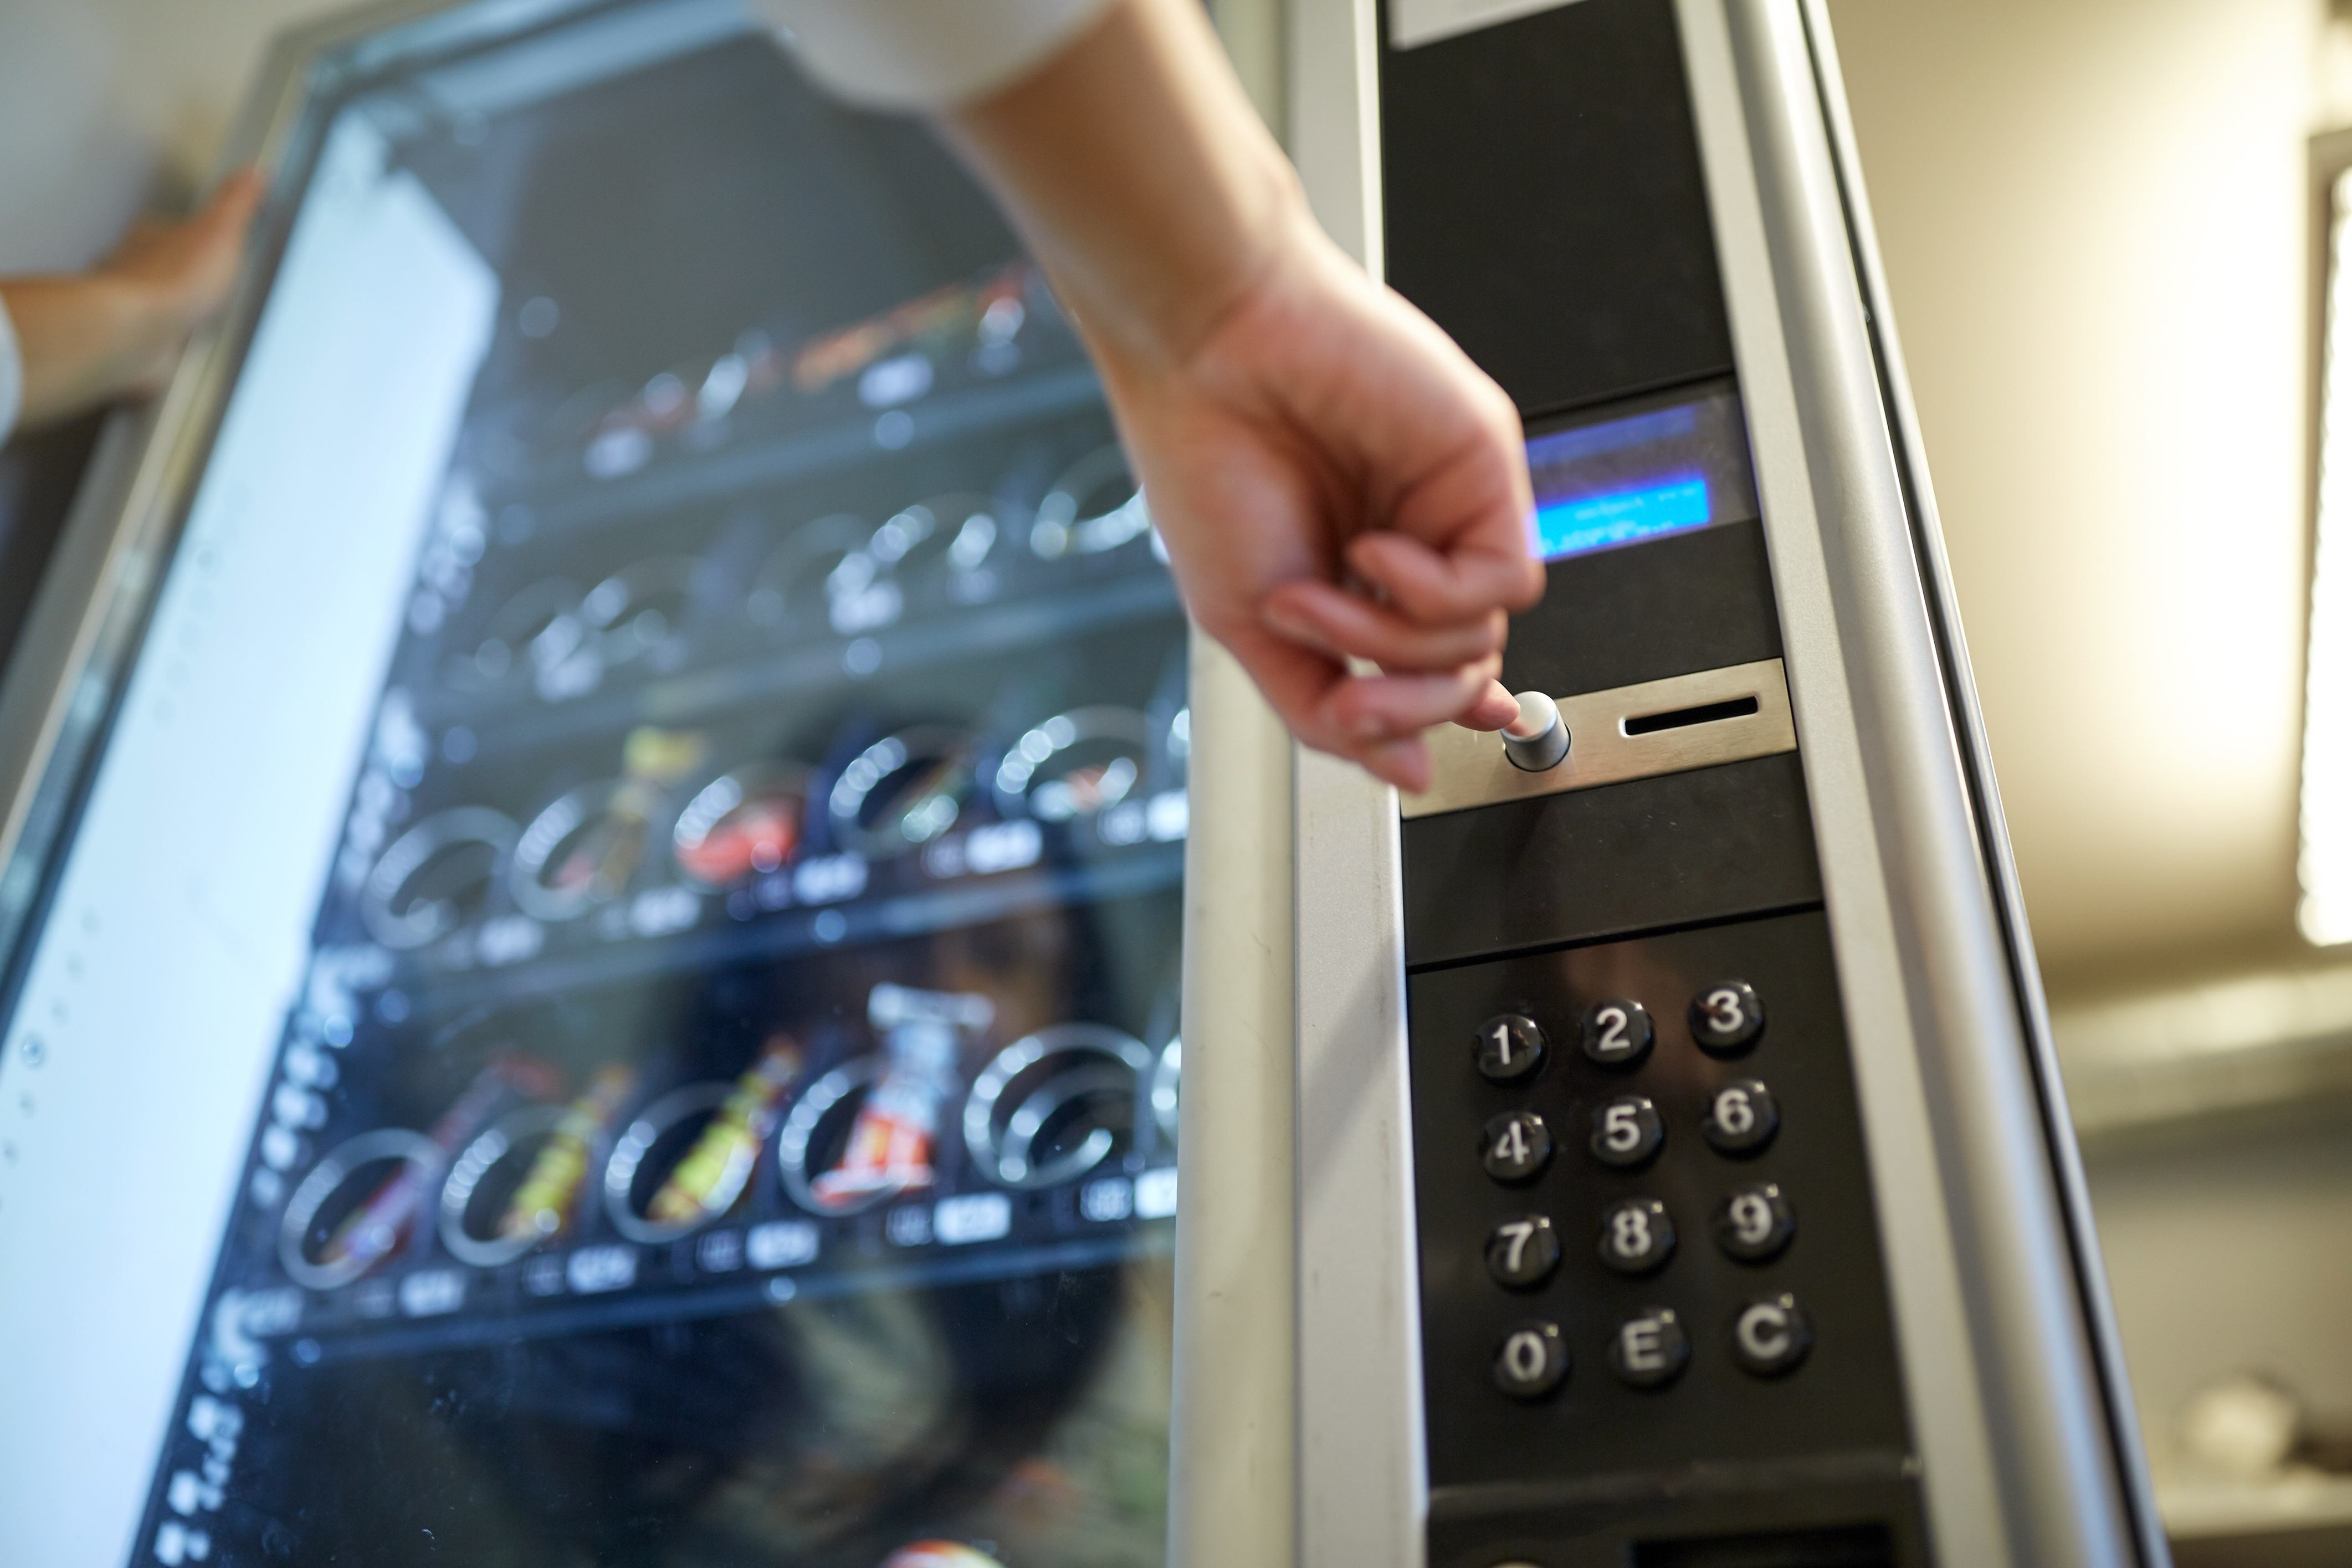 Vending Machine Equipment Leasing